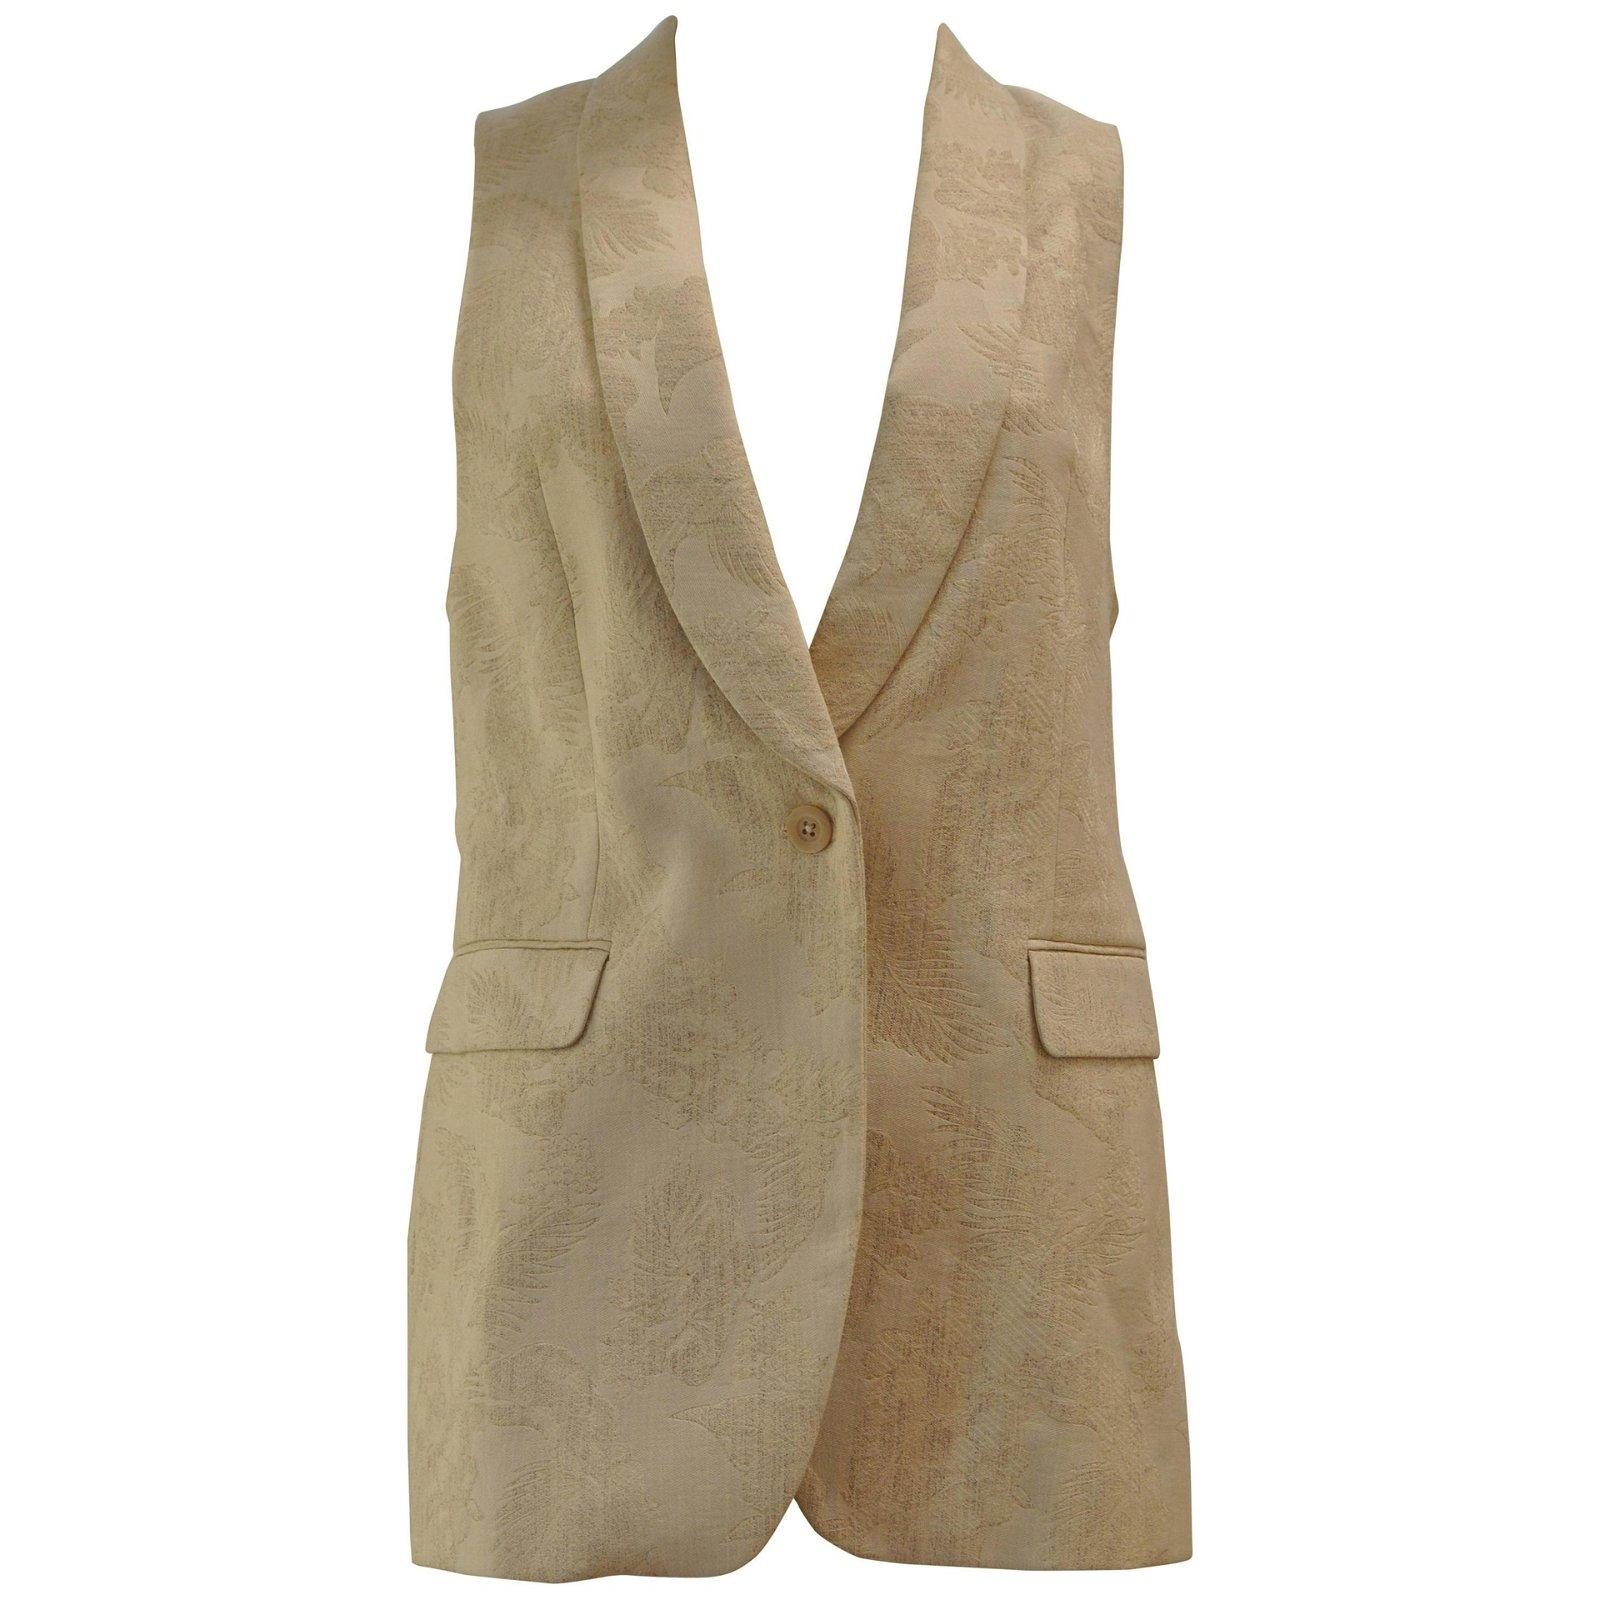 Dries Van Noten Cream Jacquard Vest Size 40